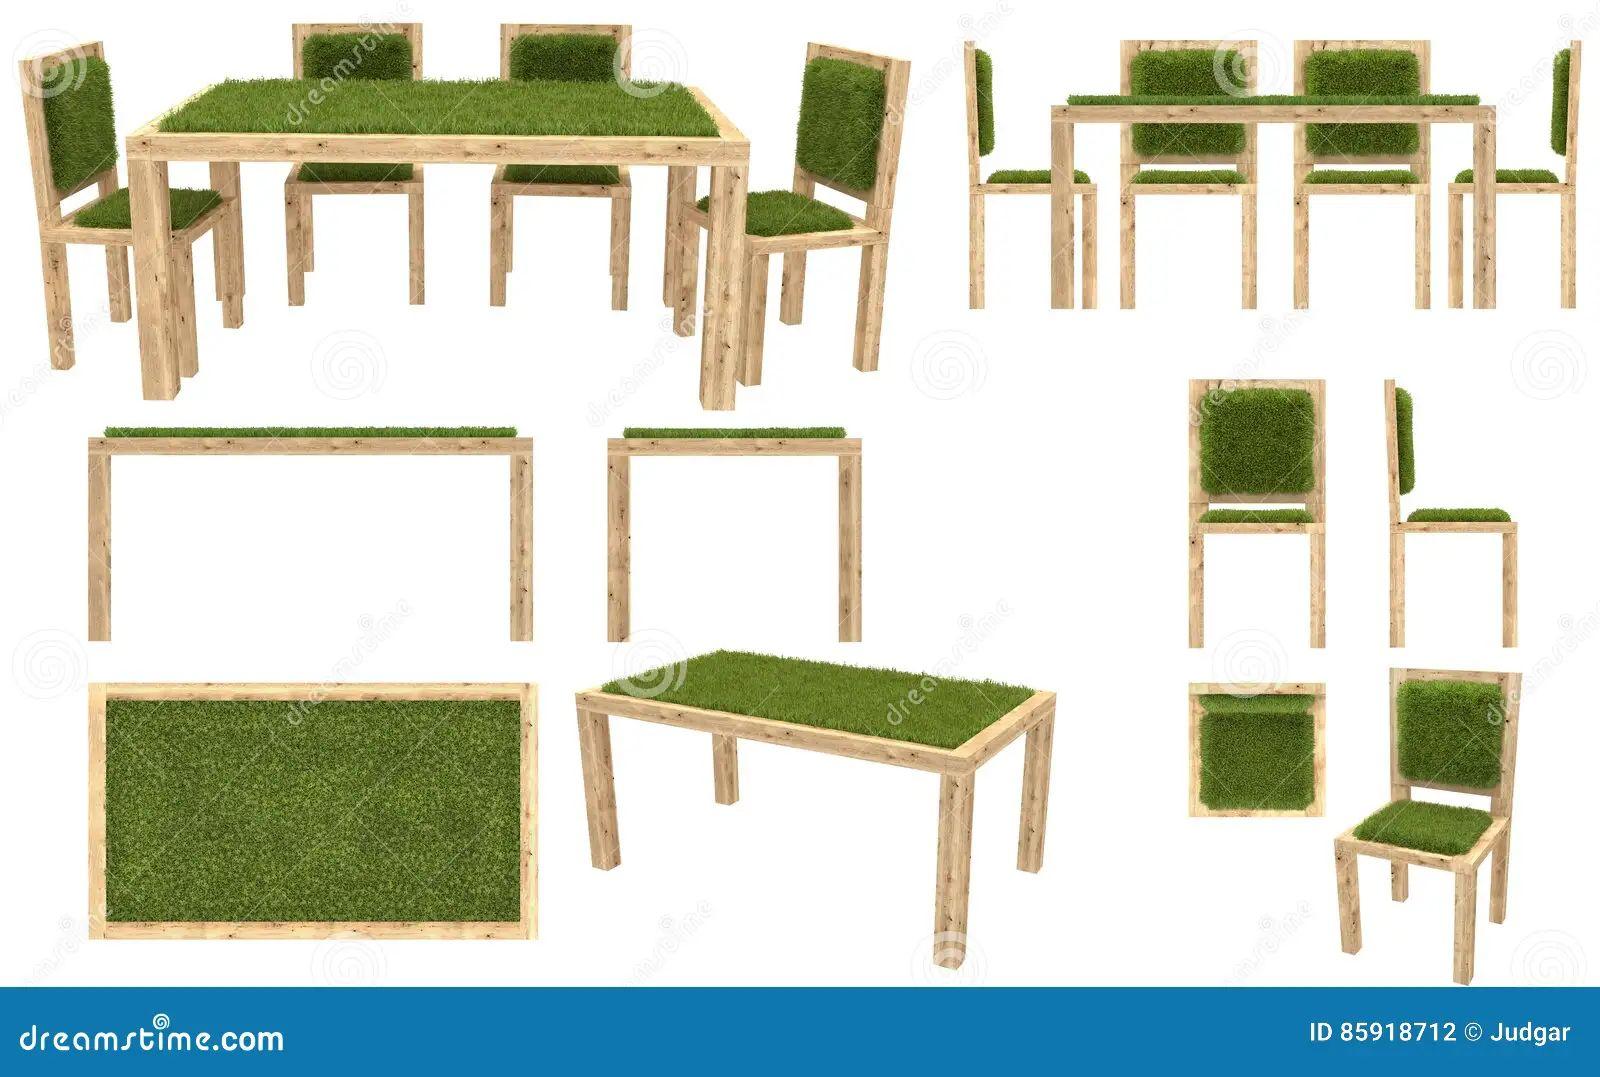 garden furniture top view download